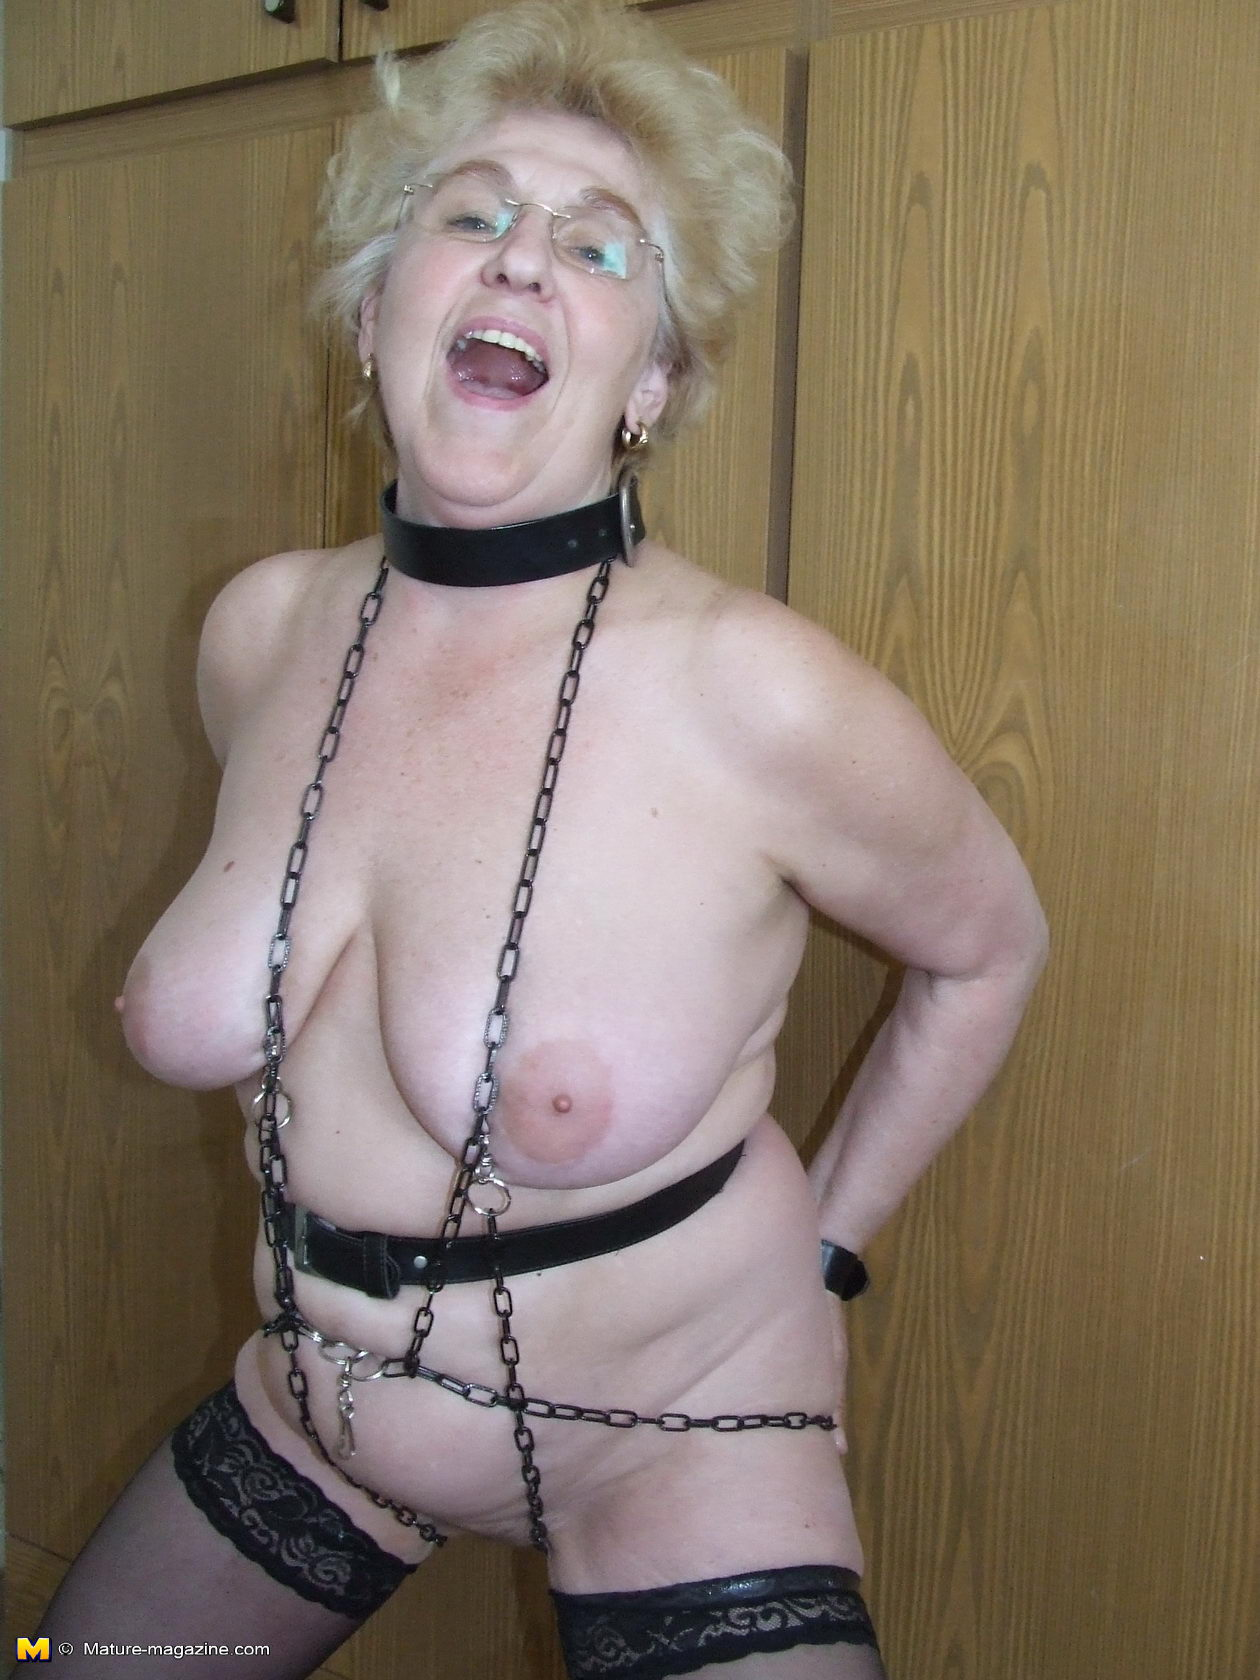 Pamela anderson naked souls alyssa milano at fakefantasy XXX